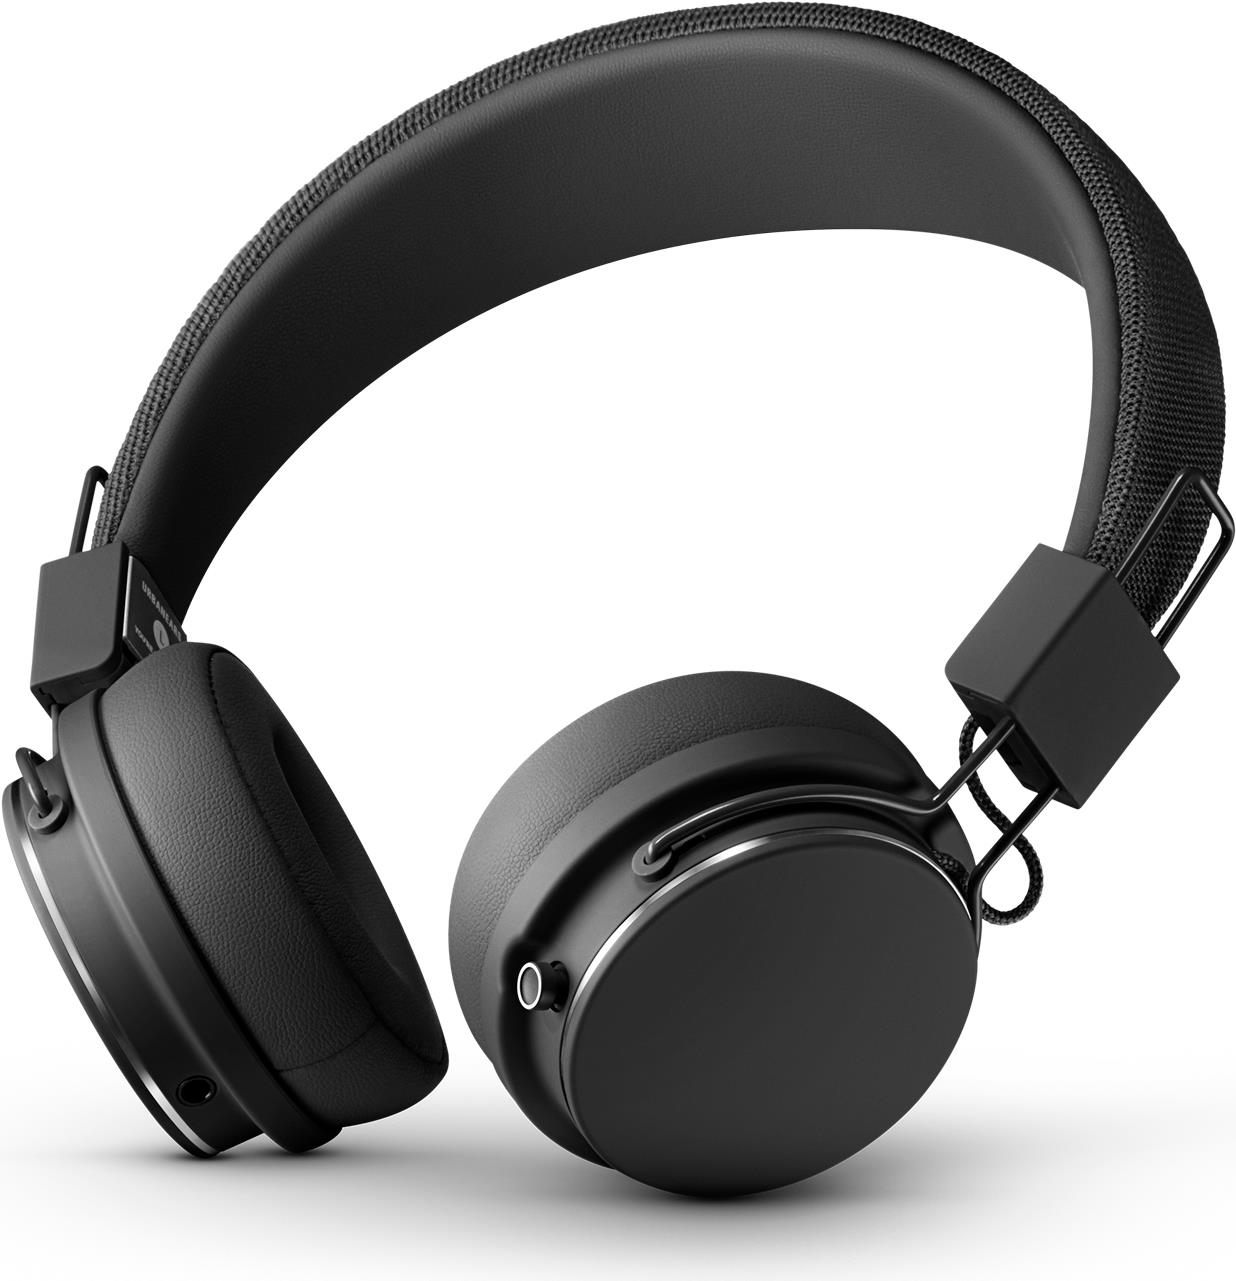 Audiozubehör - Urbanears Plattan 2 Bluetooth Black Bluetooth On Ear Kopfhörer (30 Stunden Akkulaufzeit, Faltbar, Eingebautes Mikrofon) (04092110)  - Onlineshop JACOB Elektronik